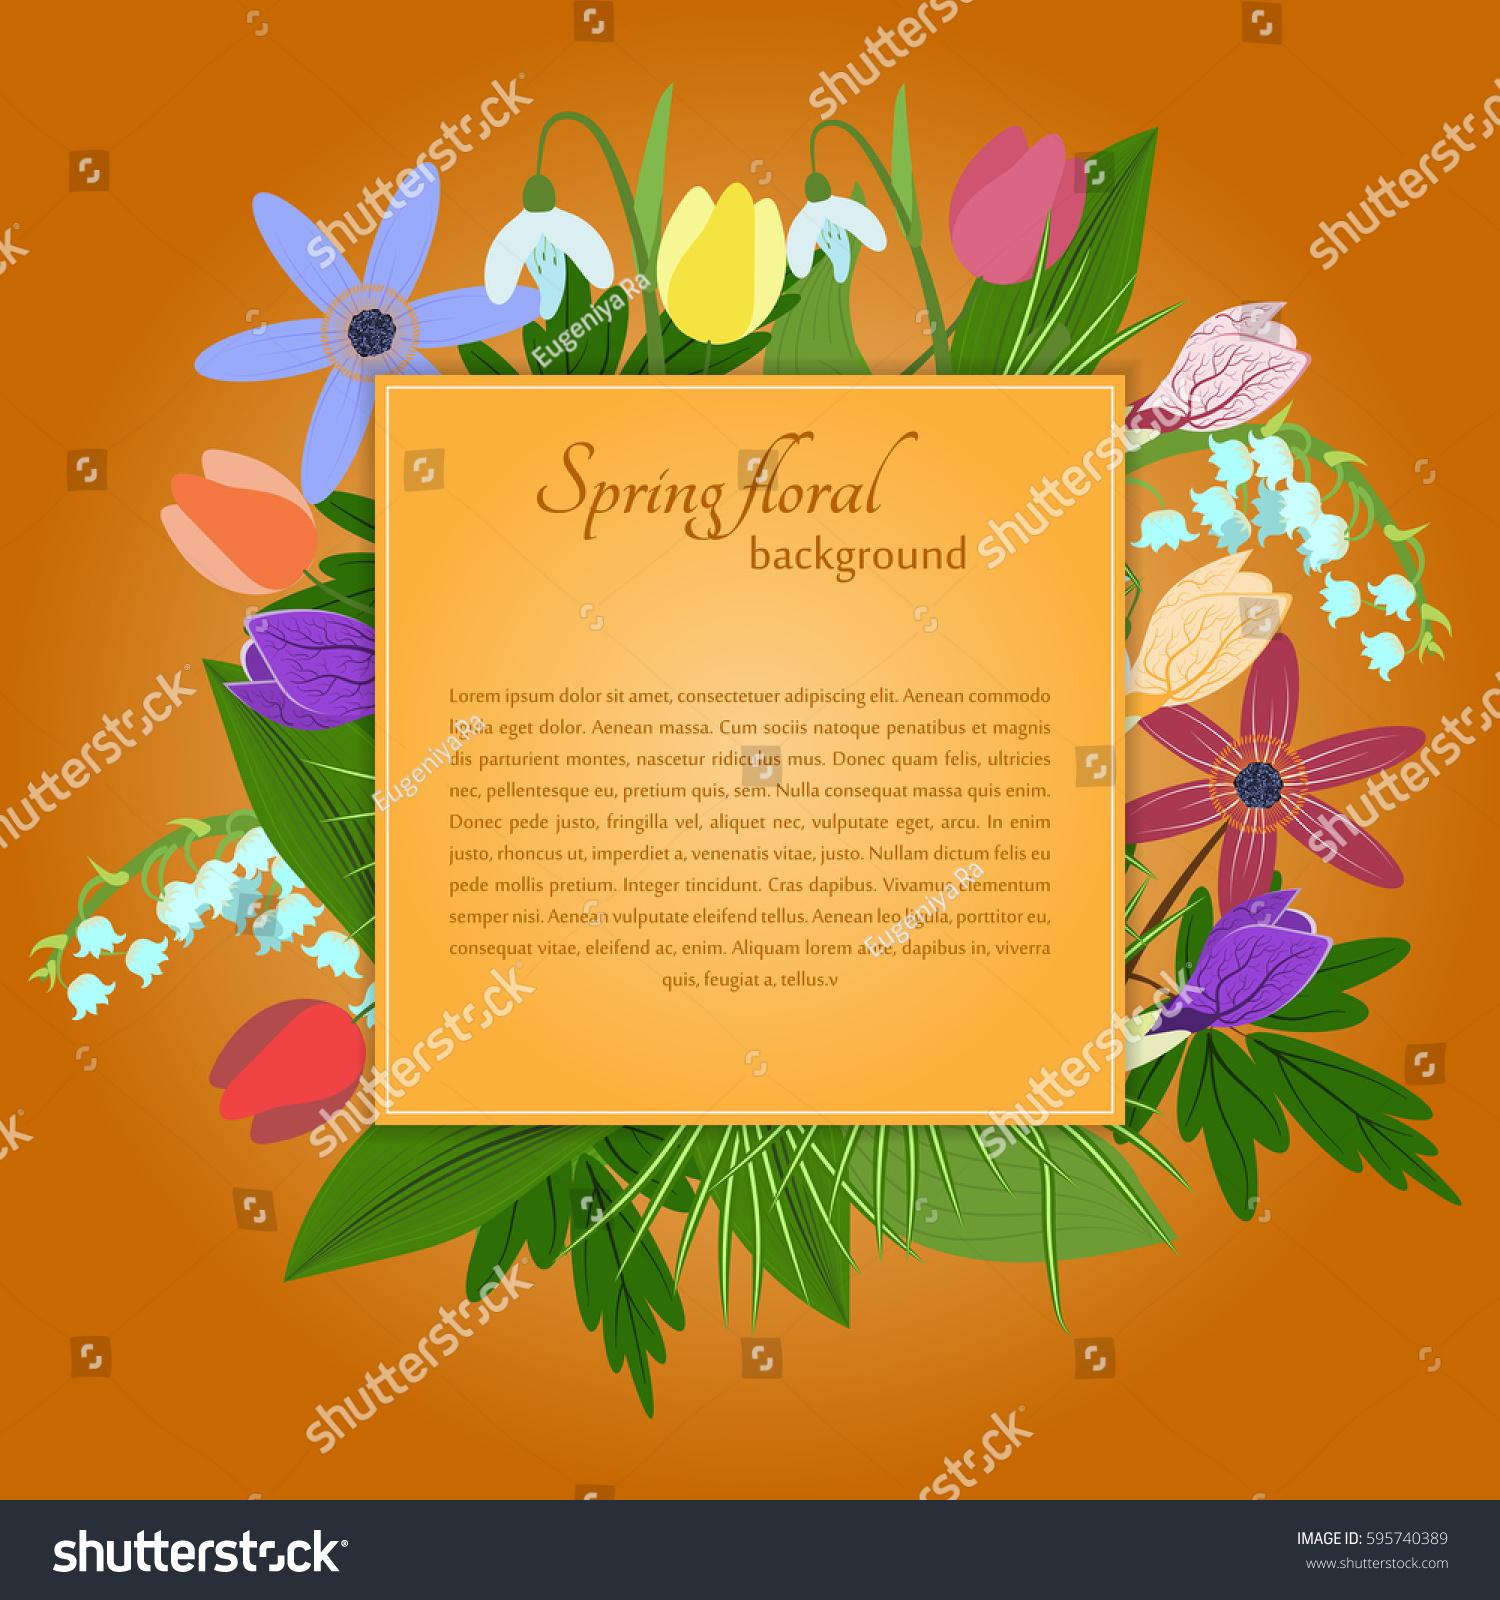 invitations cardswebsitesbackground websites home - photo #38